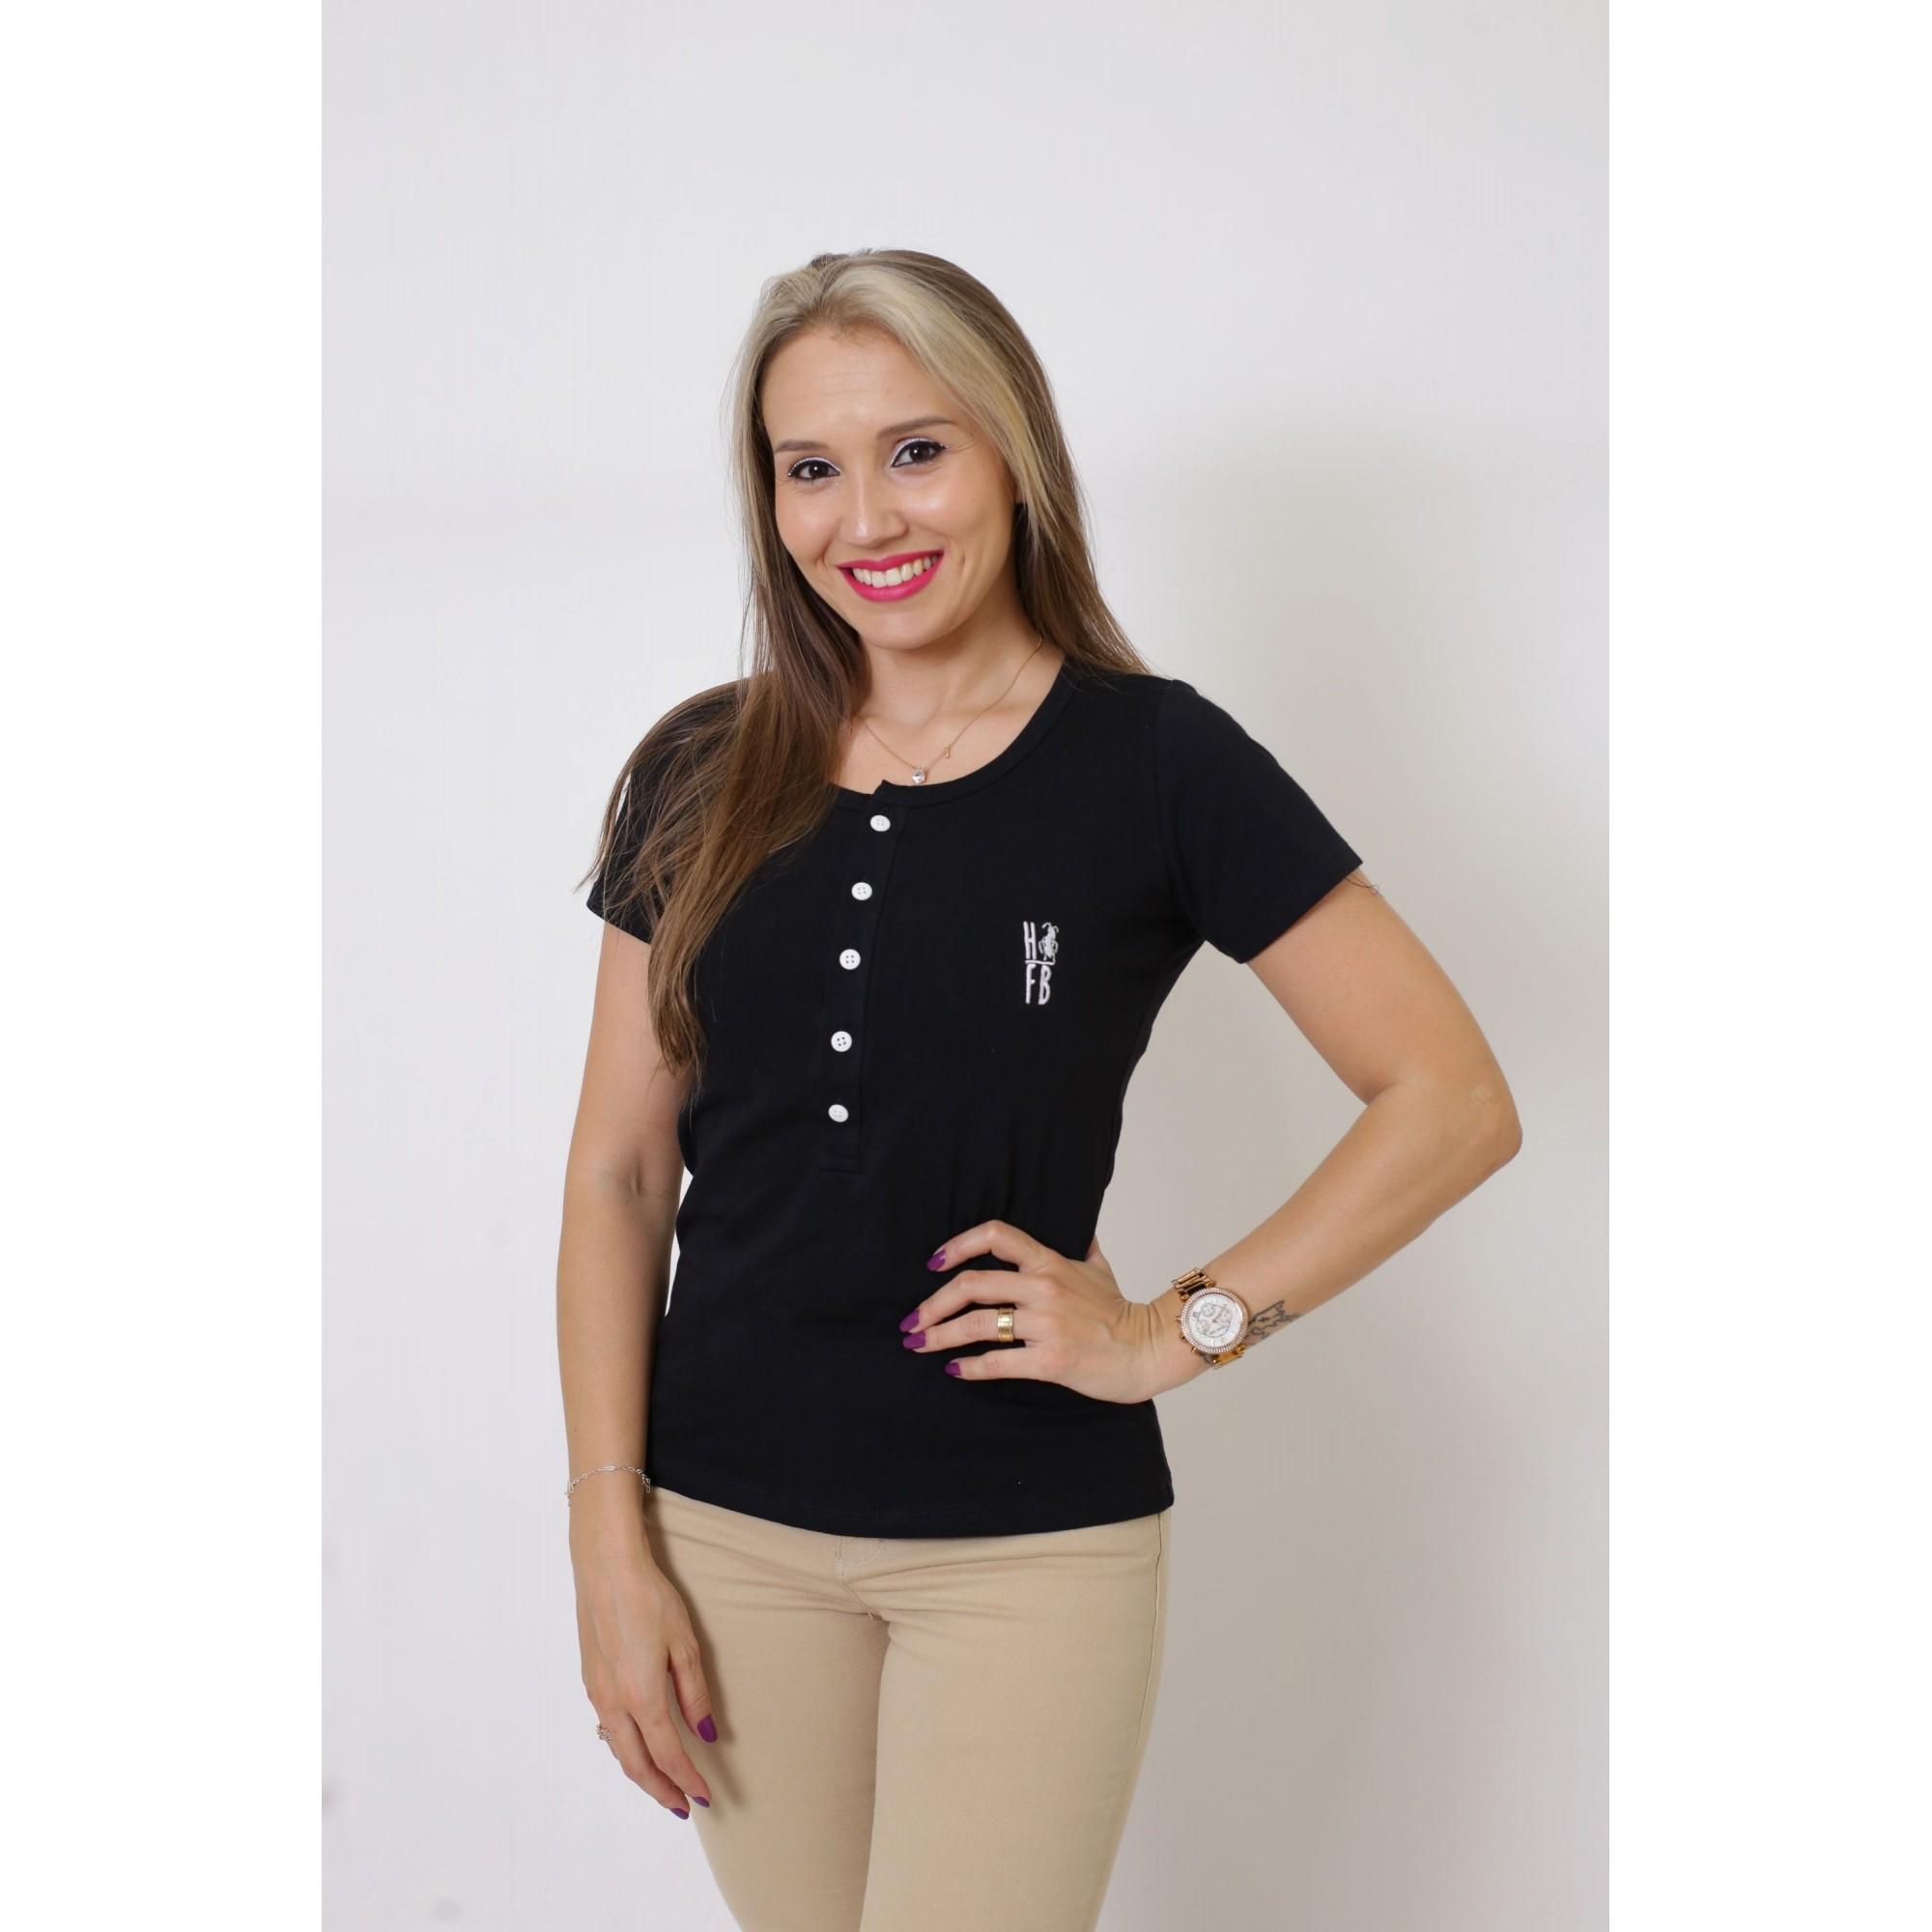 MÃE E FILHOS > Kit 02 Peças - T-Shirt + Body Henley - Preto [Coleção Tal Mãe Tal Filho]  - Heitor Fashion Brazil